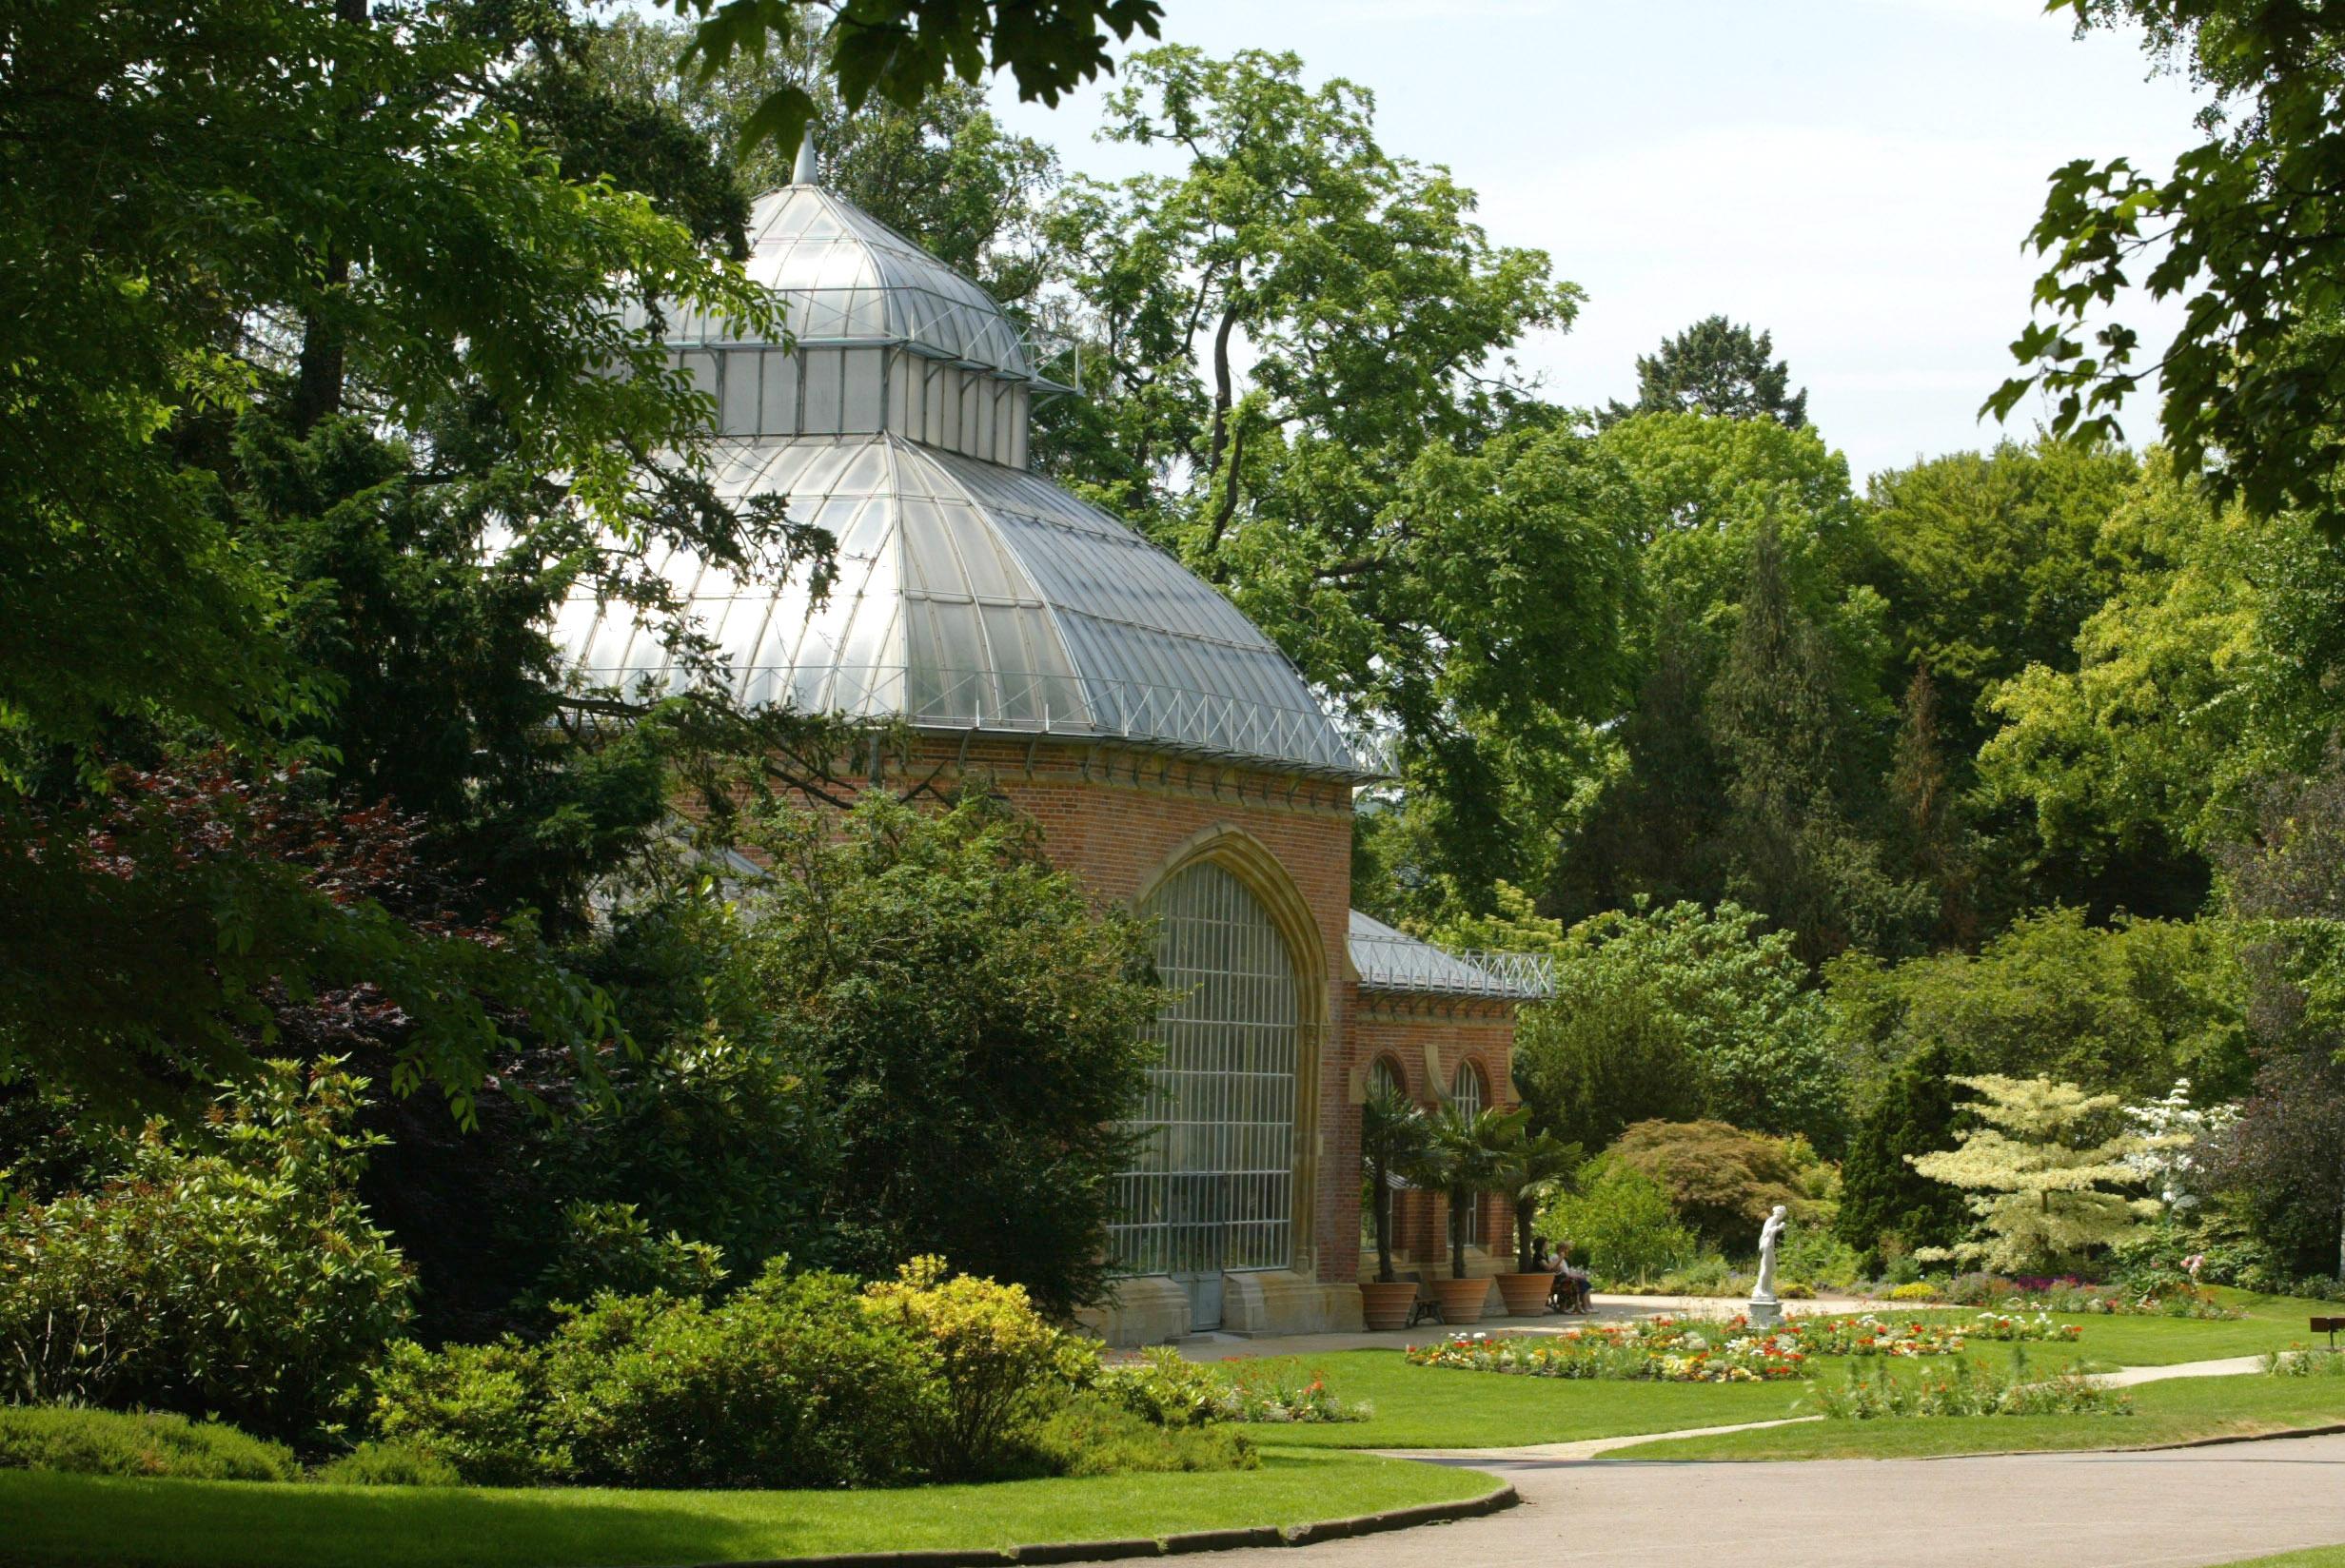 Le jardin botanique de metz promenades for Jardin fabert metz